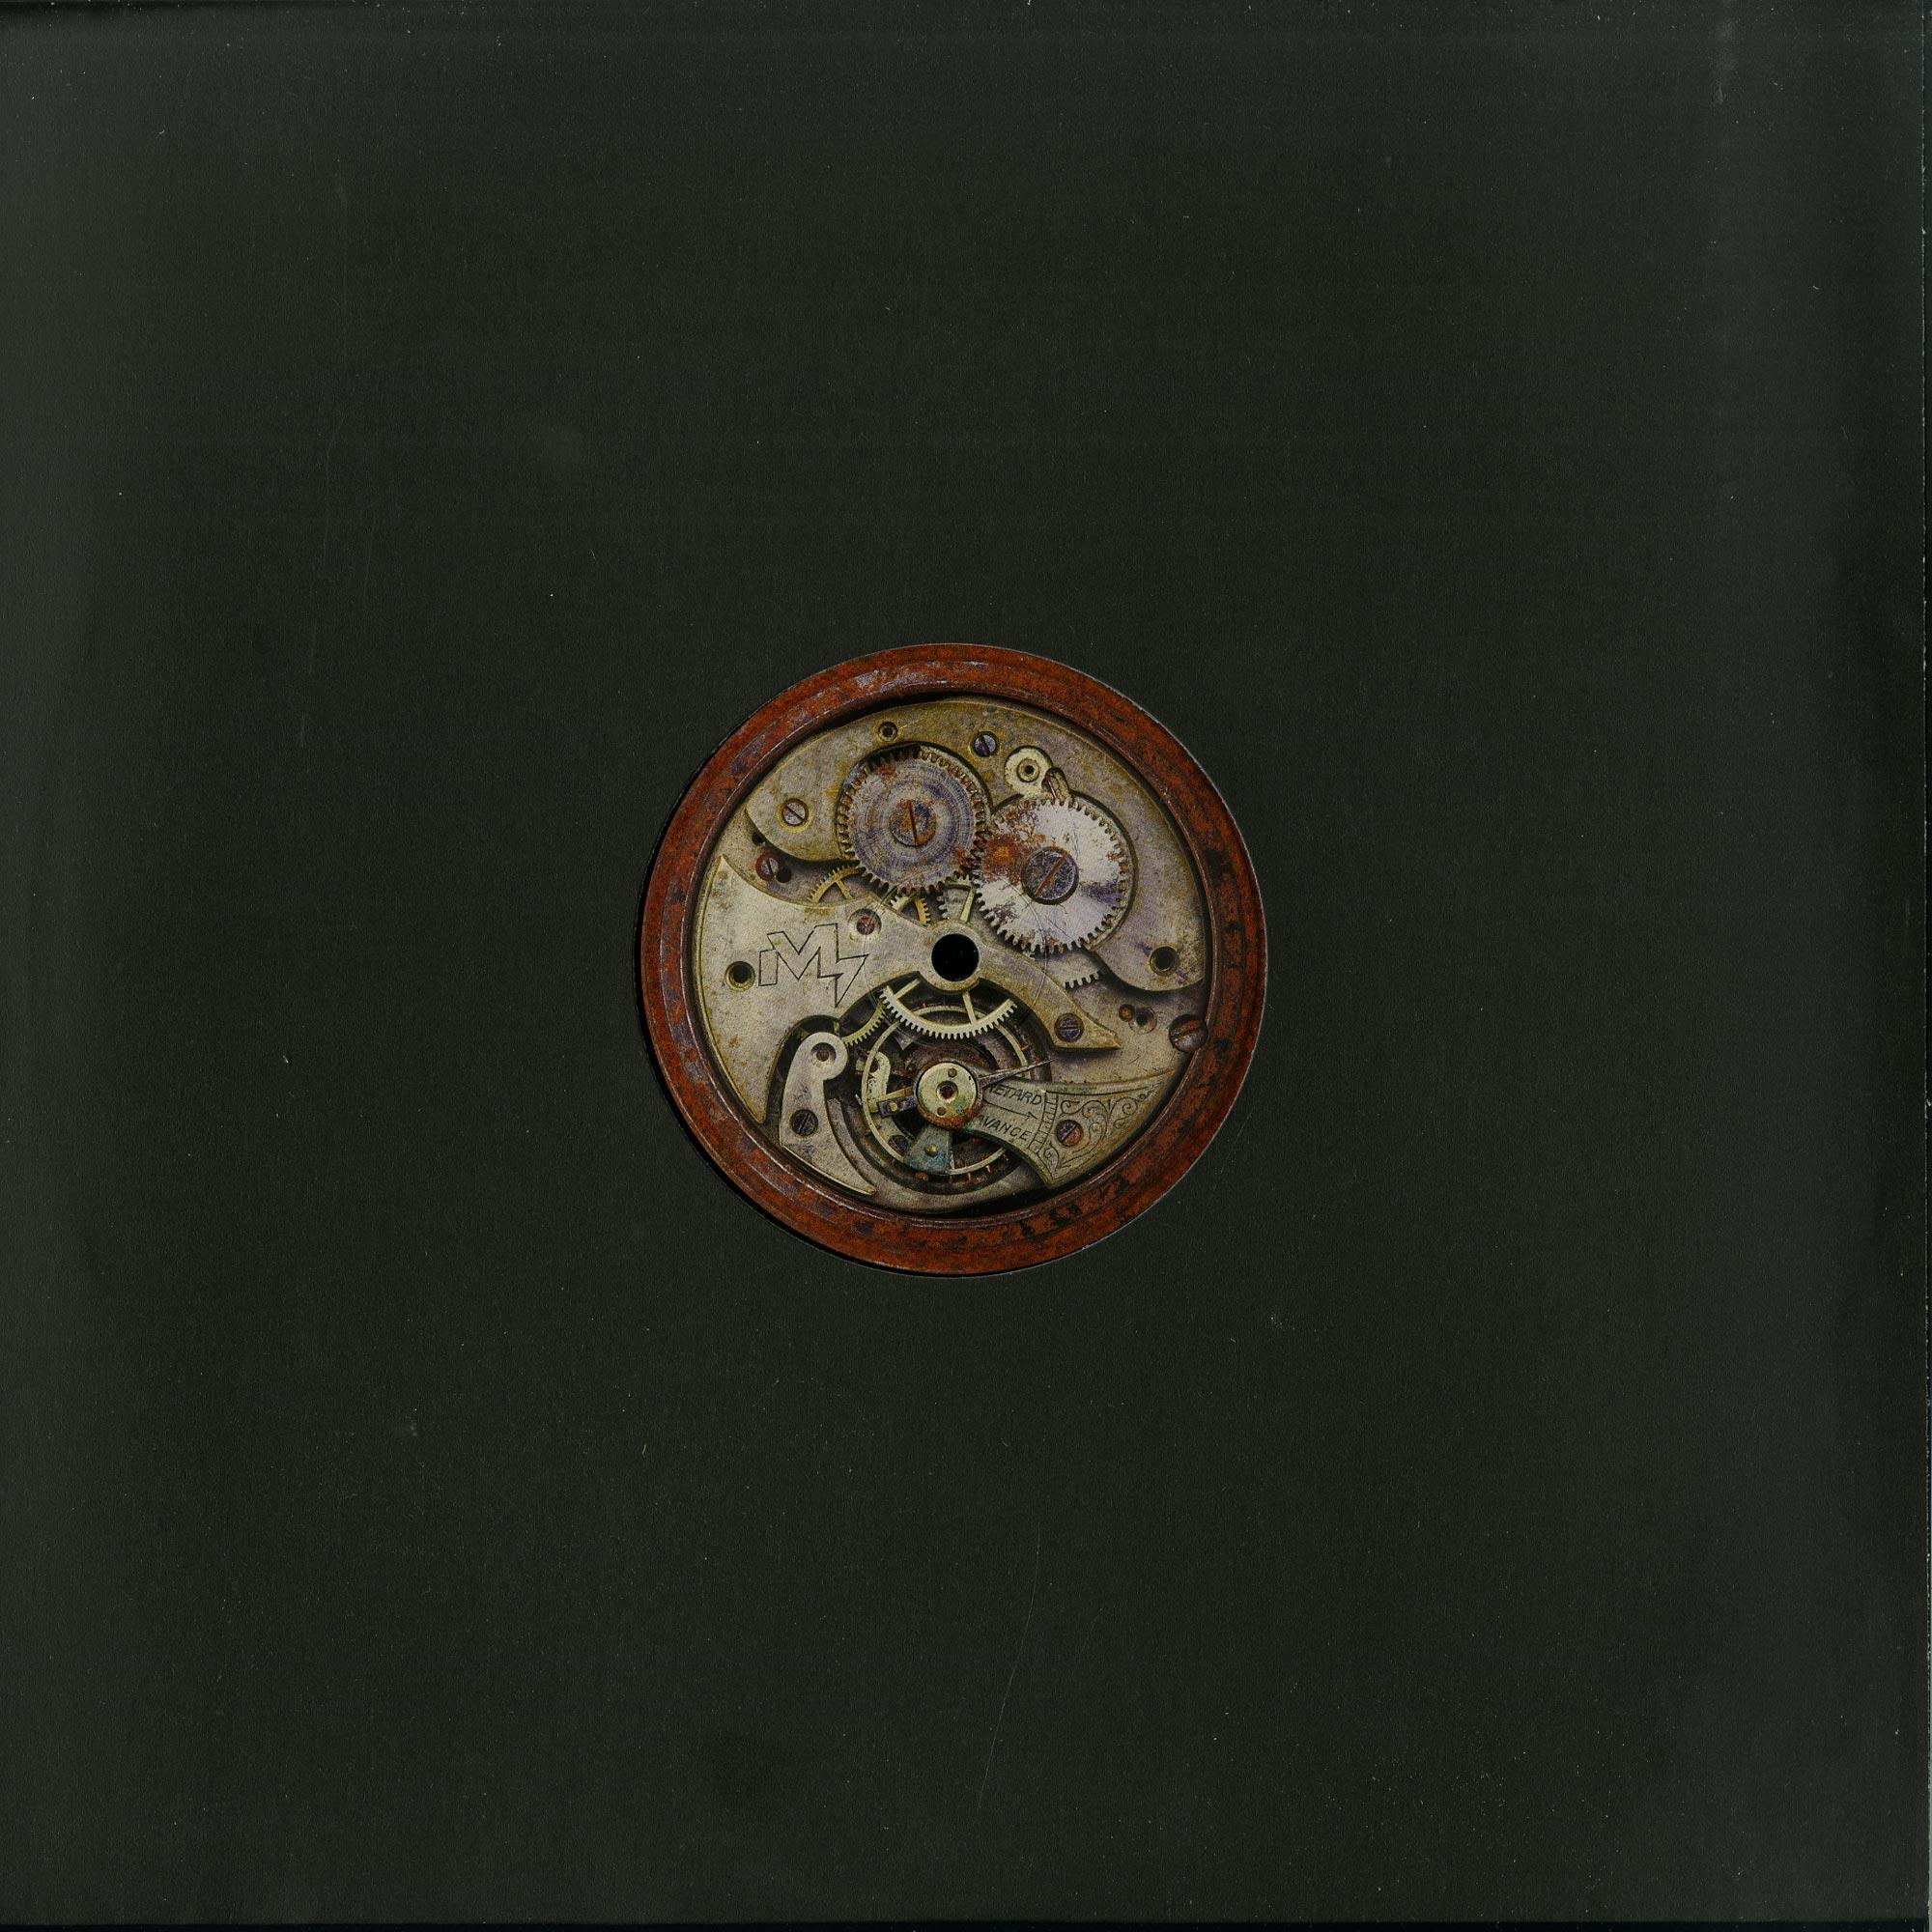 Michael James - THE SUMMIT EP